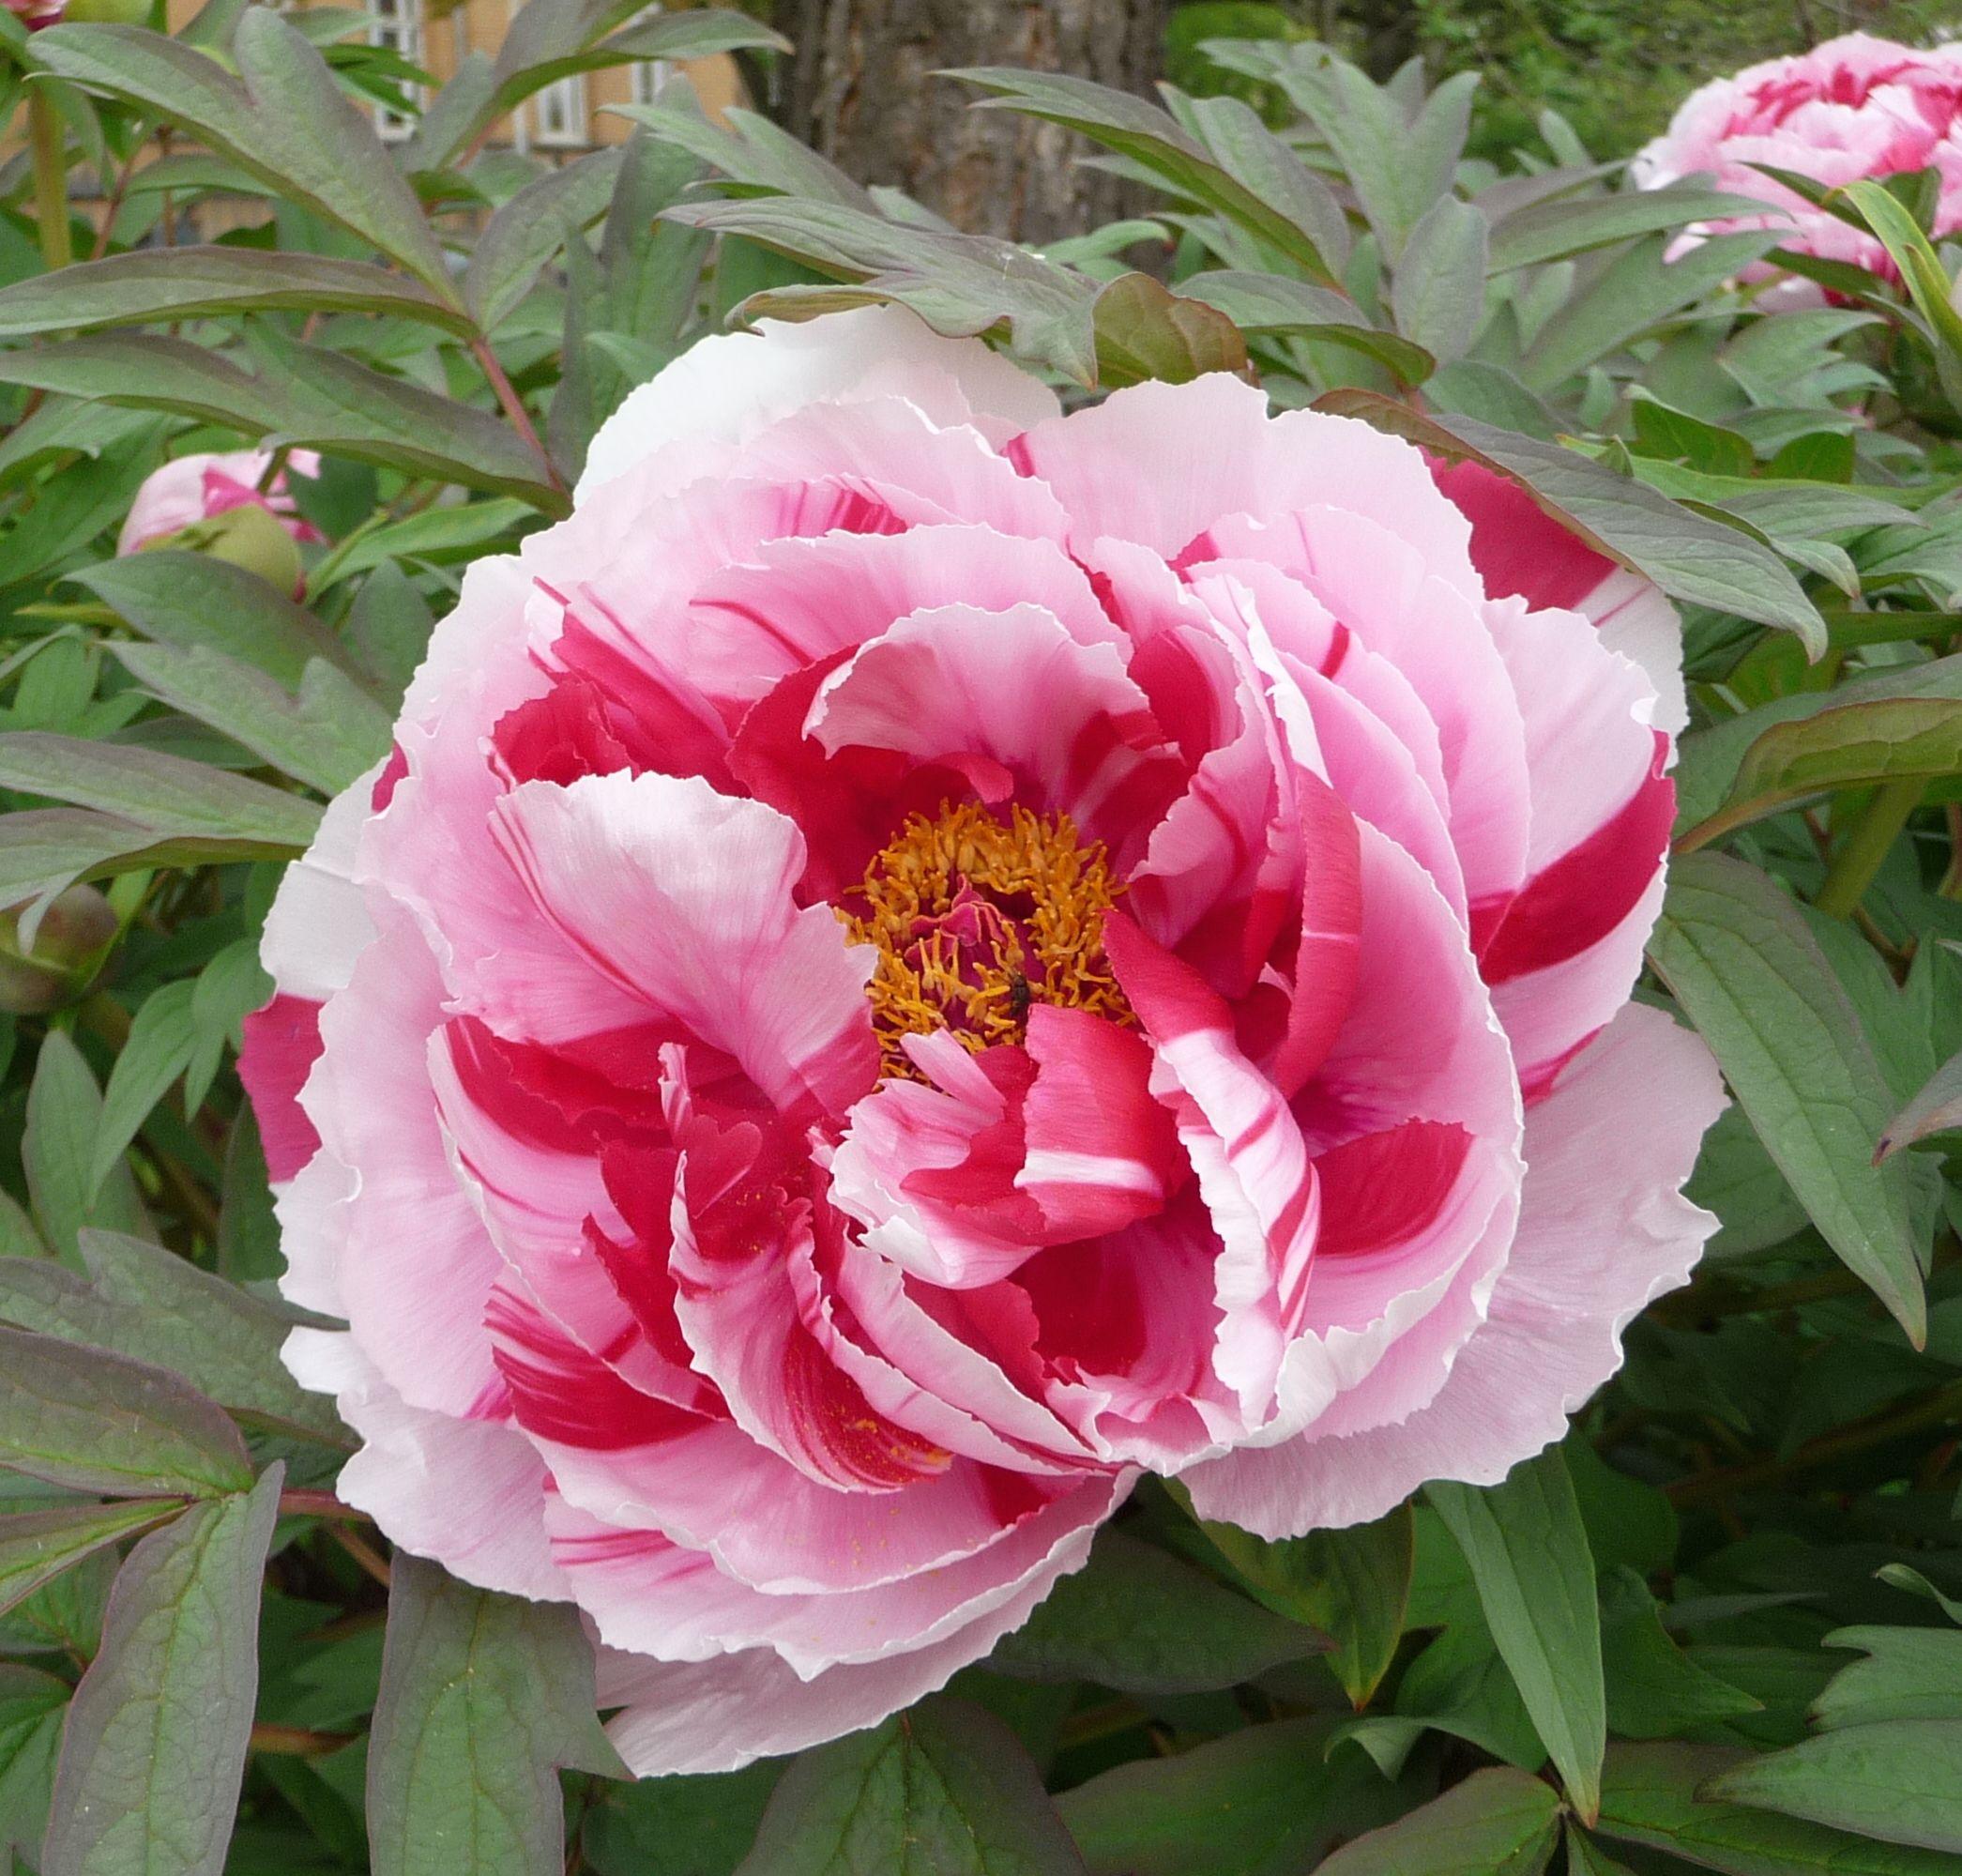 paeonia suffruticosa cv shimanishiki flores. Black Bedroom Furniture Sets. Home Design Ideas